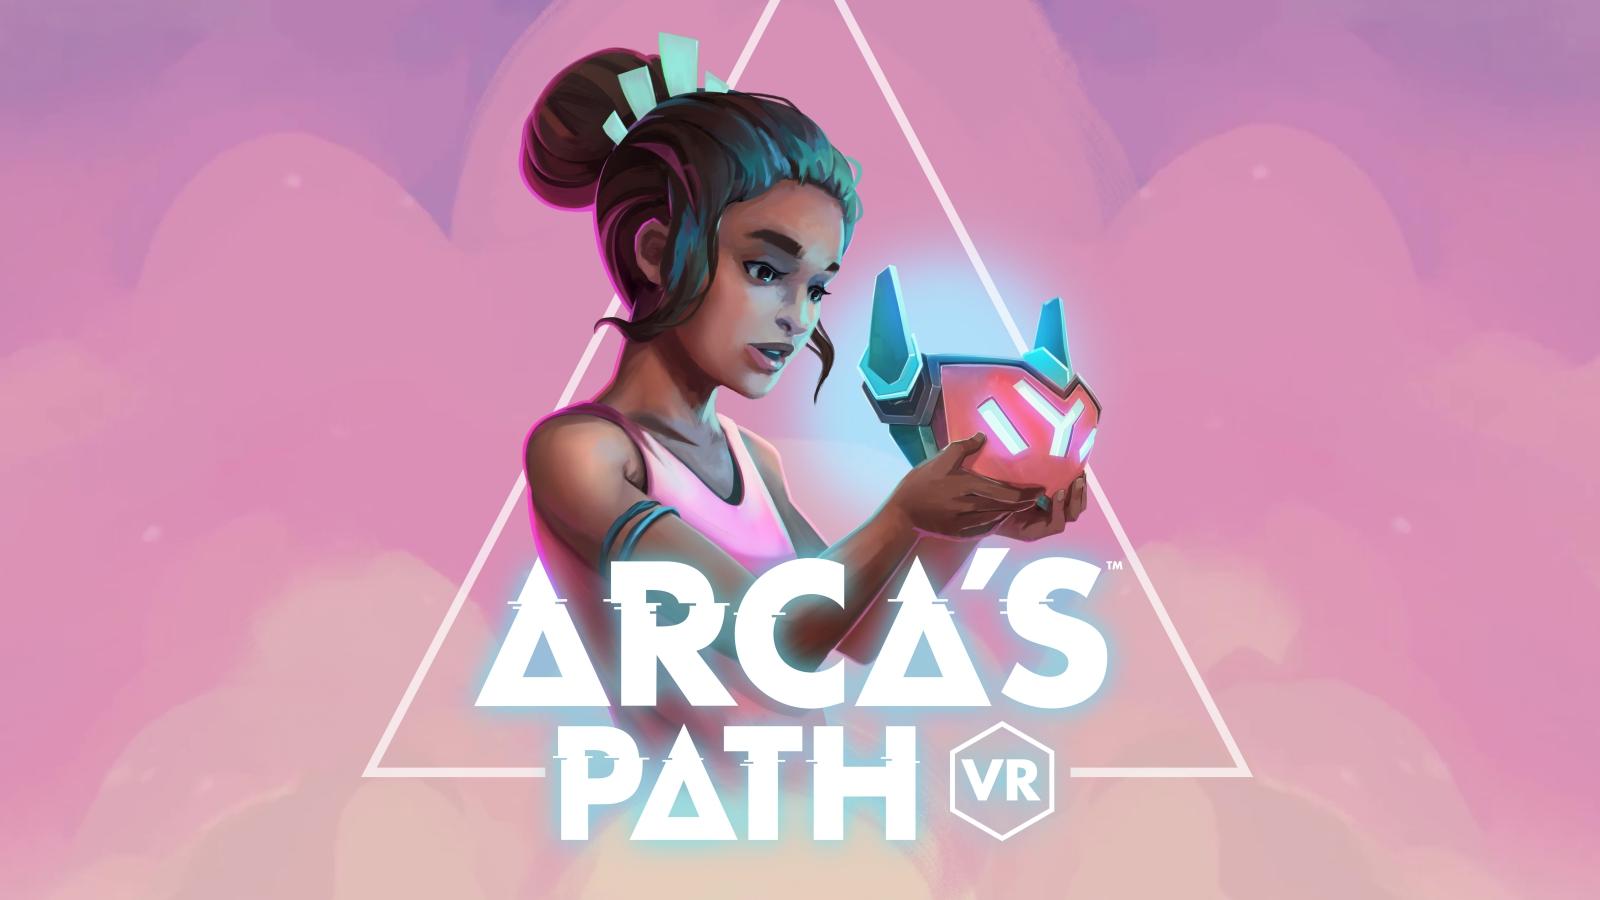 Arca's Path VR, l'hands-on del rilassante puzzle game in realtà virtuale thumbnail